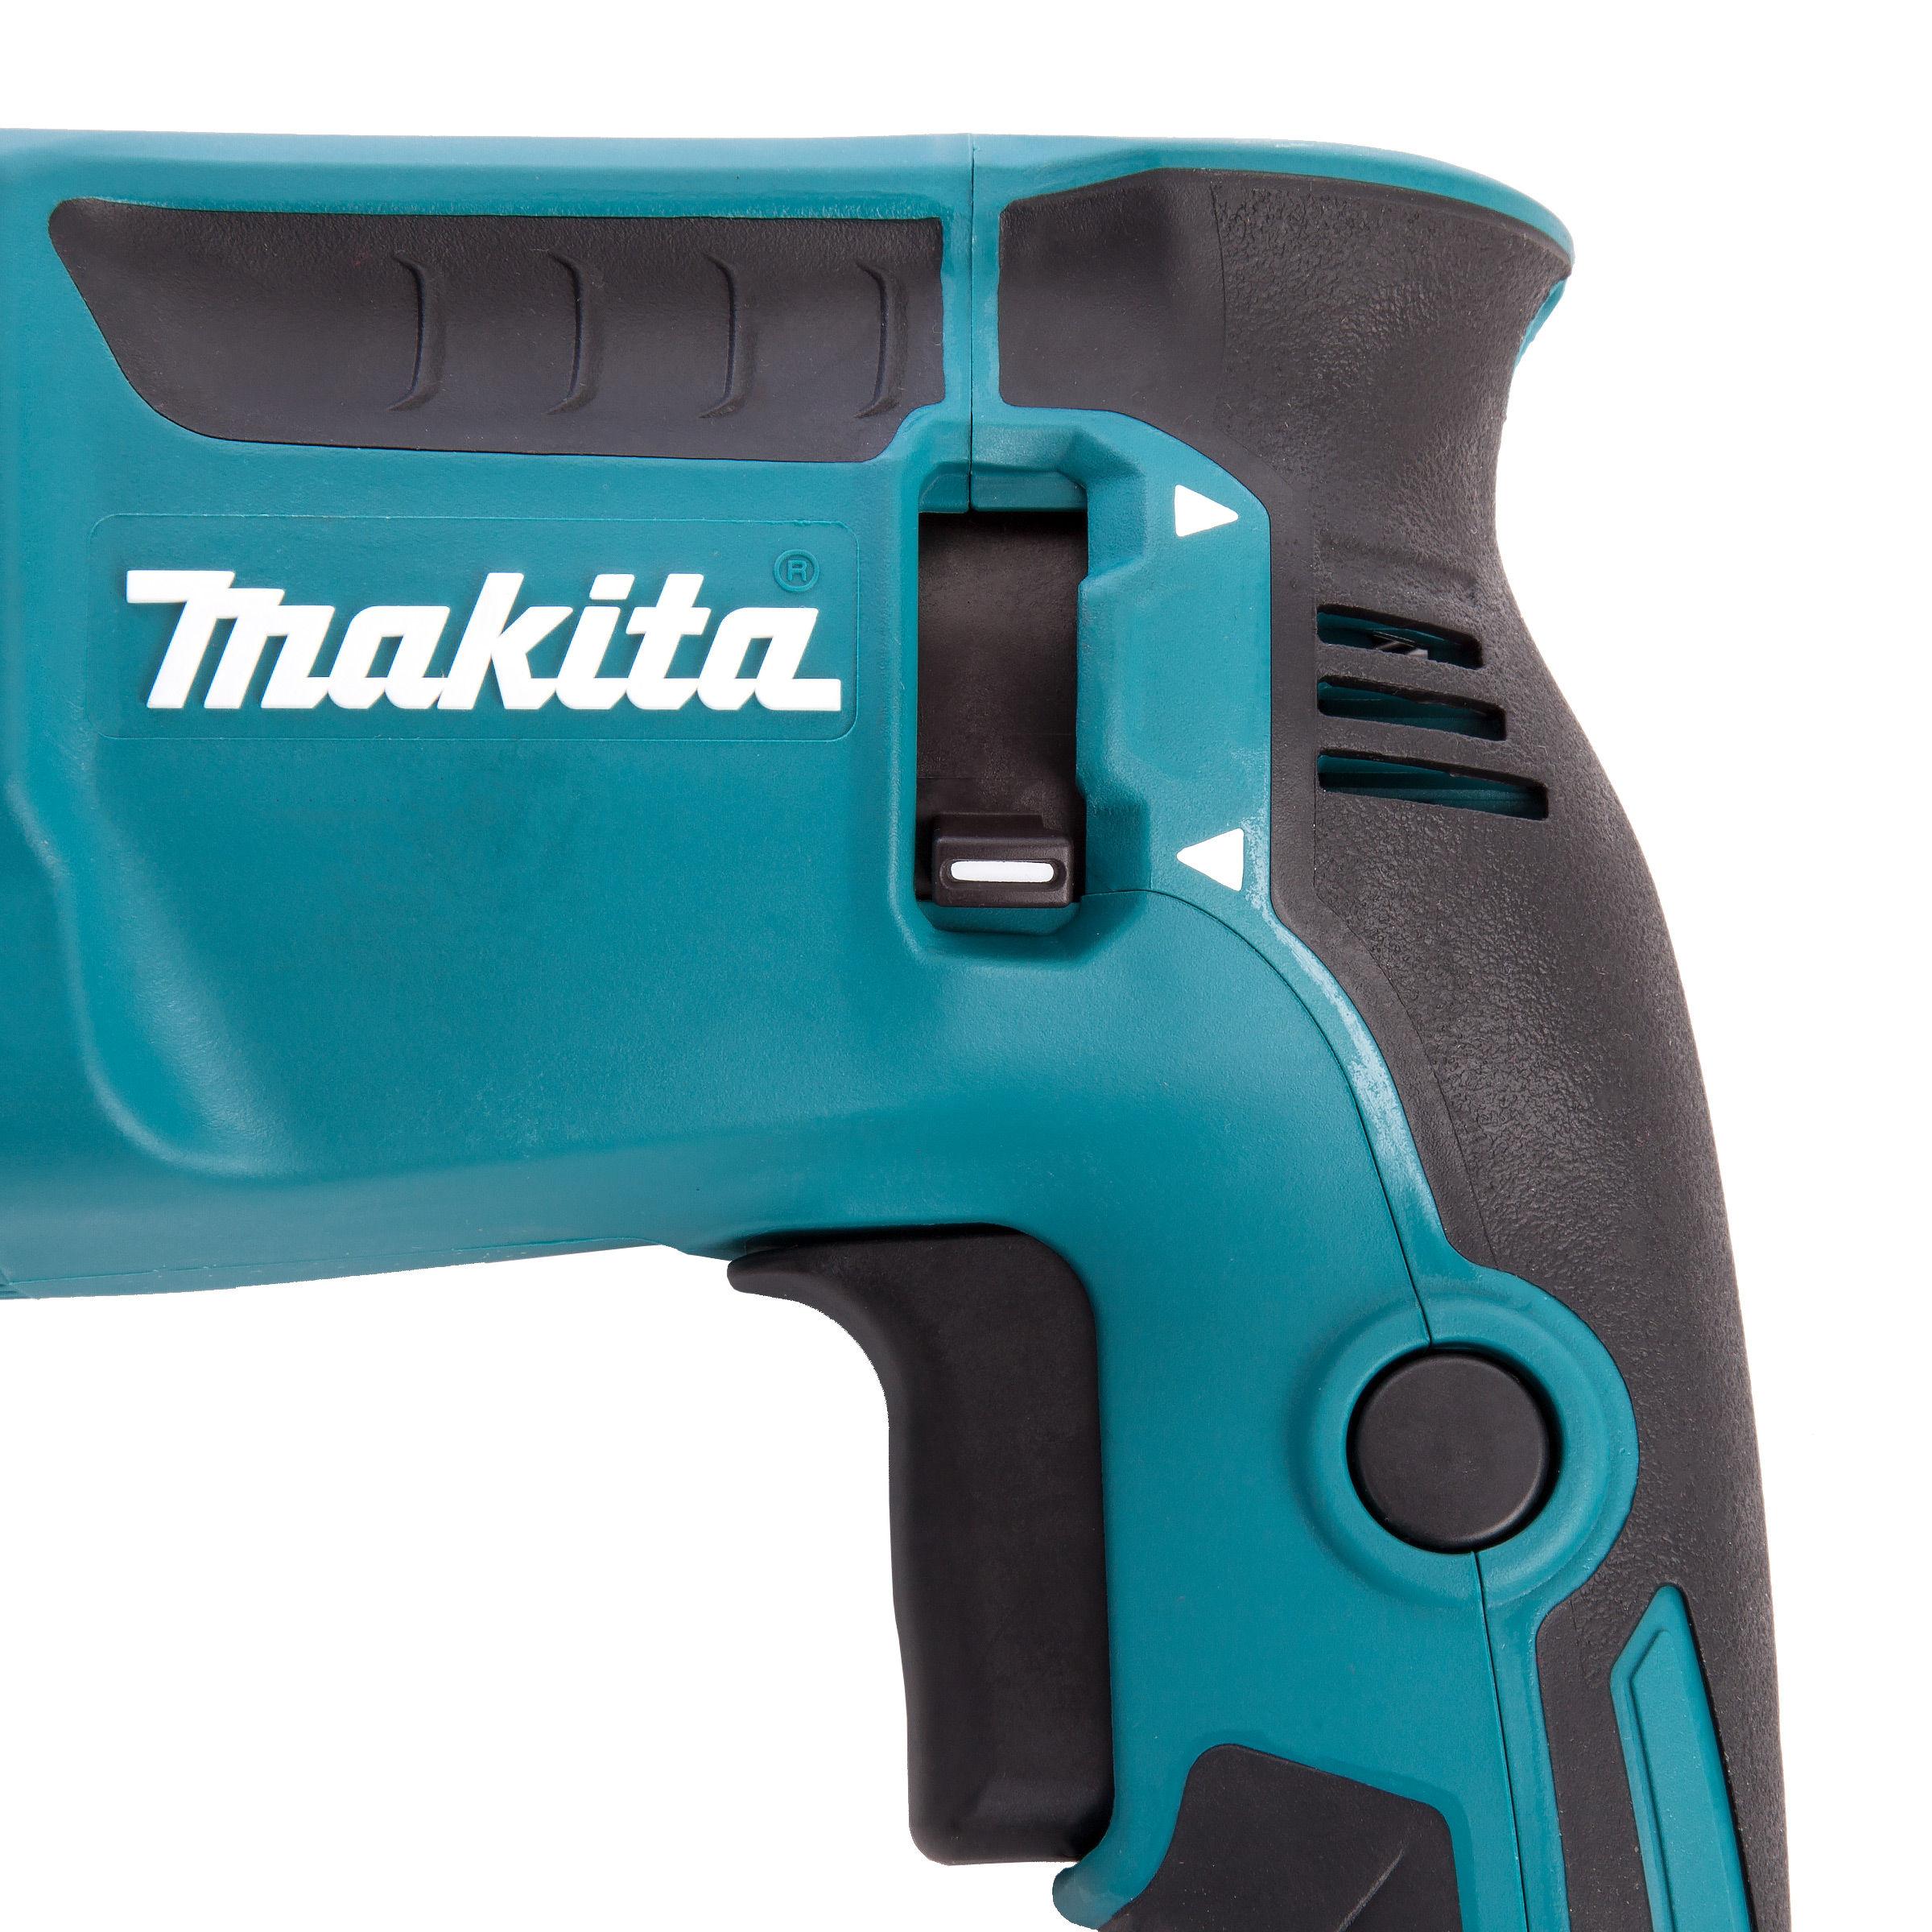 Toolstop Makita Hr1840 18mm Sds Rotary Hammer